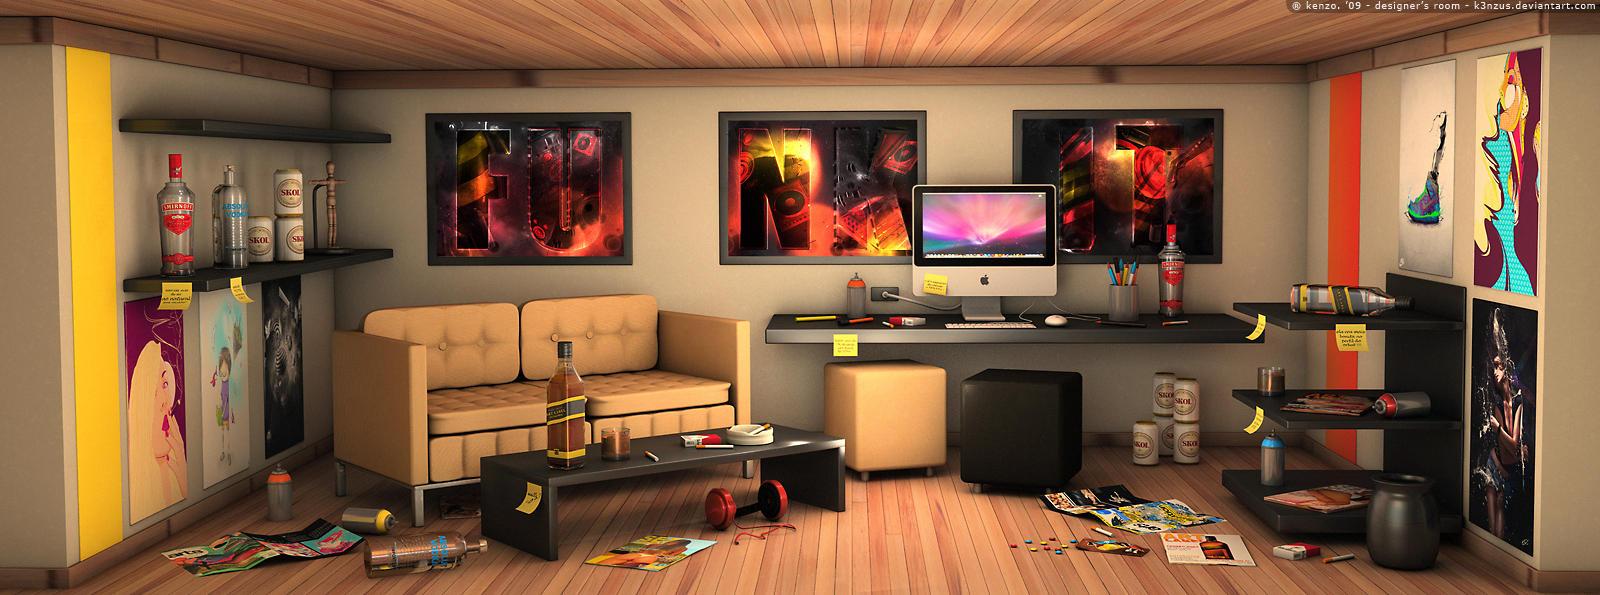 Classic 3d Desktop Workplace Wallpaper Designer S Room By K3nzus On Deviantart